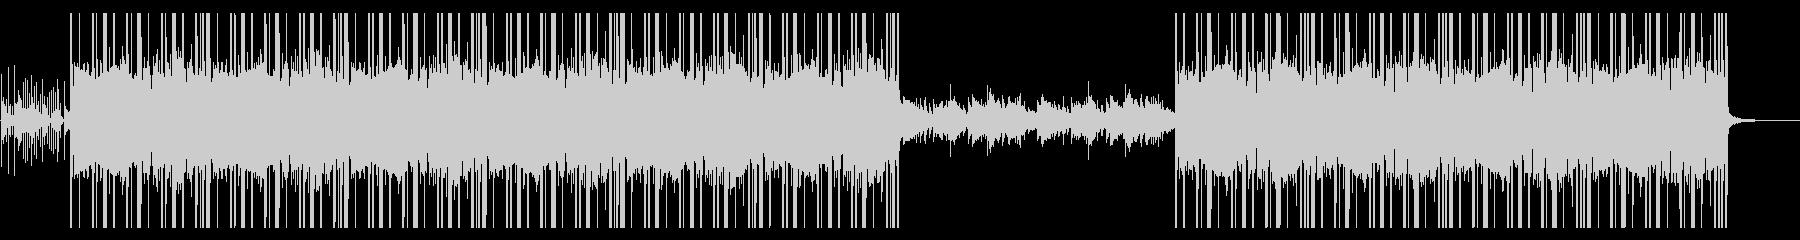 Vtuber向けBGM 和風ヒップホップの未再生の波形